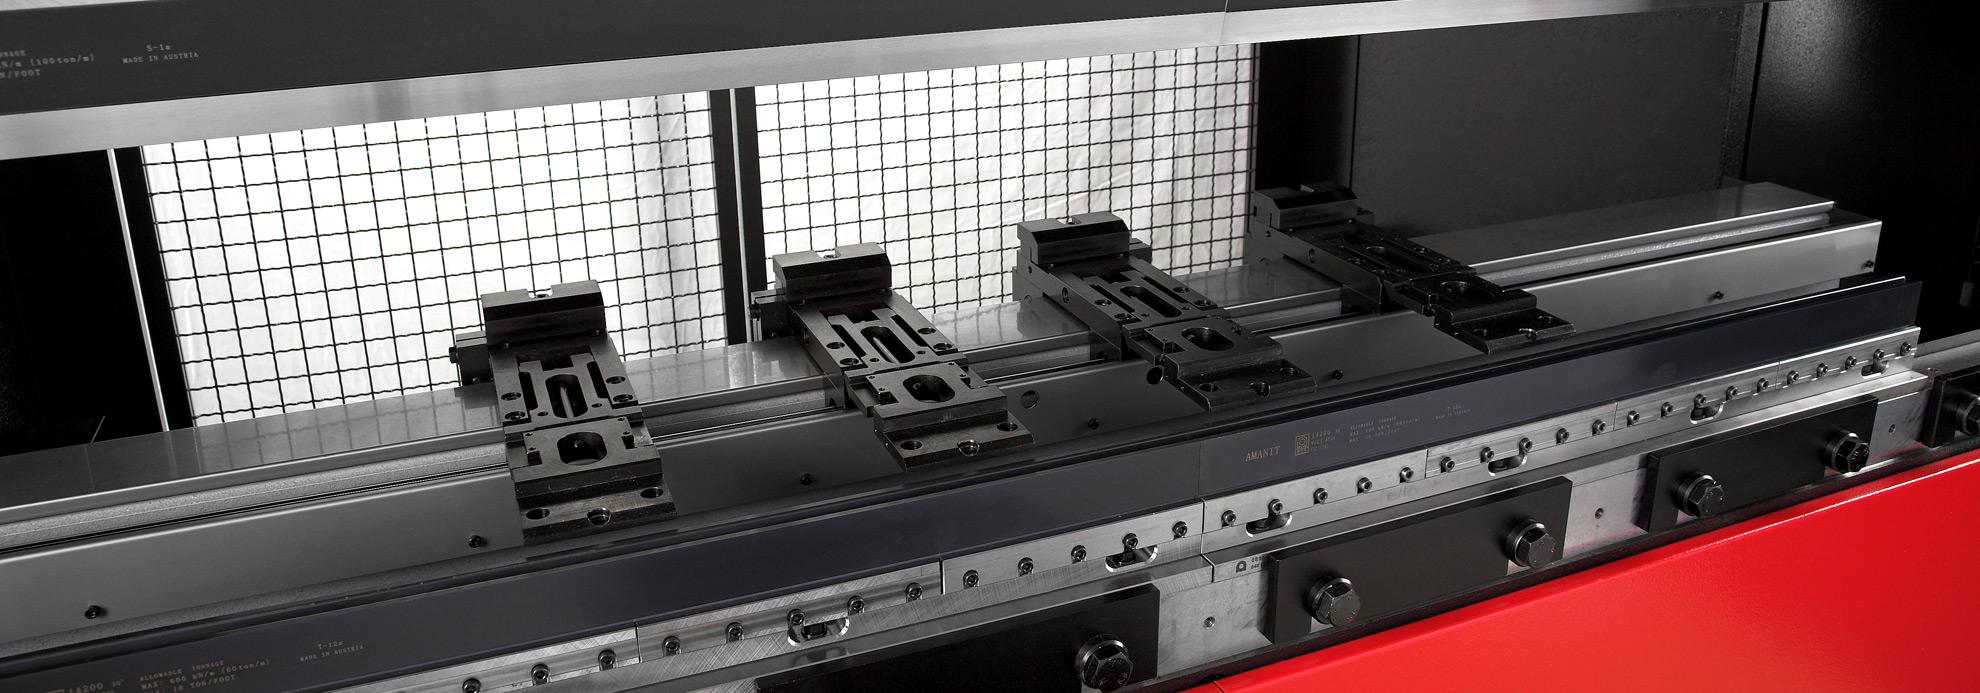 High performance press-brake backgauge rail made of an extruded aluminium